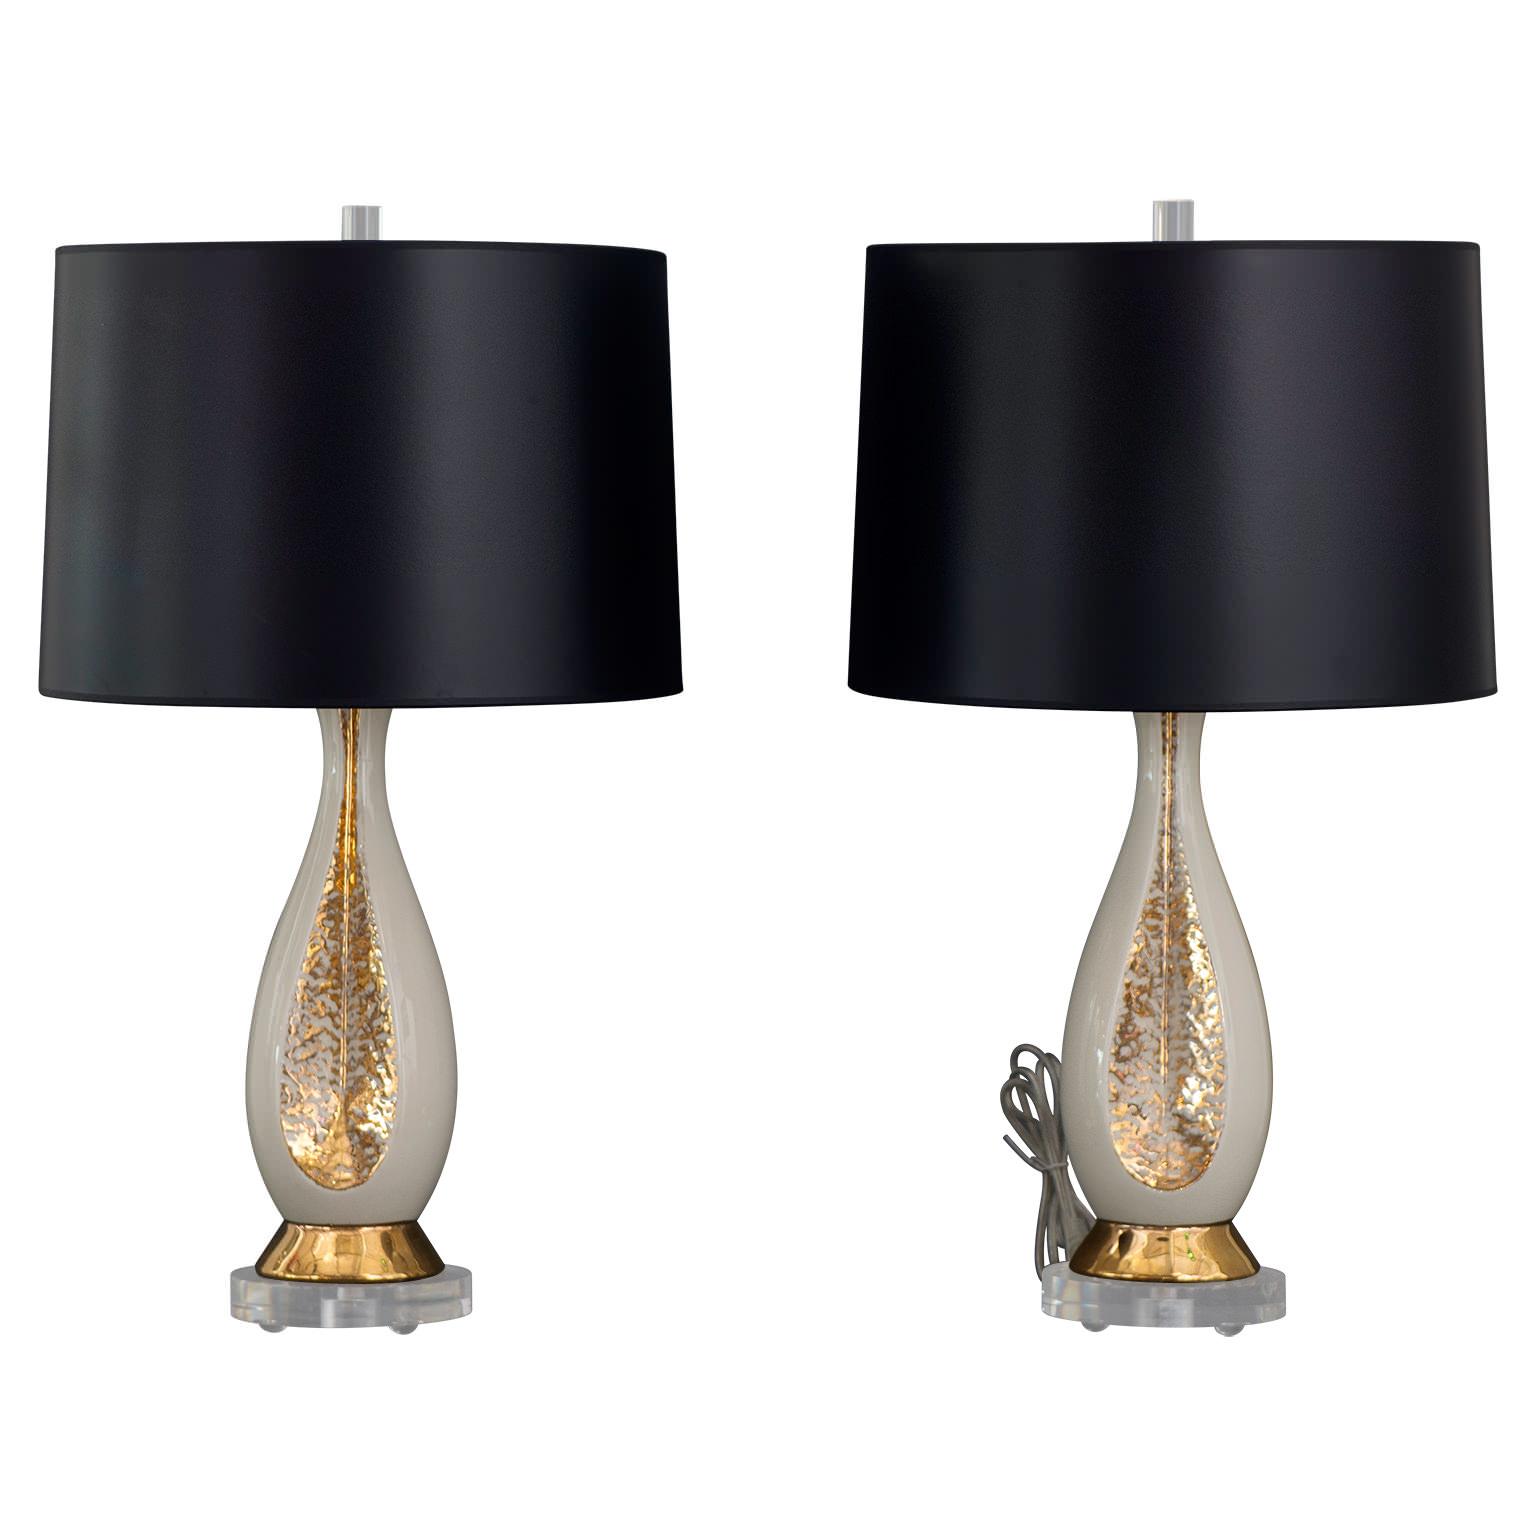 Mrspkandoz pair of danish creamy white gold table lamps pair of danish creamy white gold table lamps mozeypictures Gallery